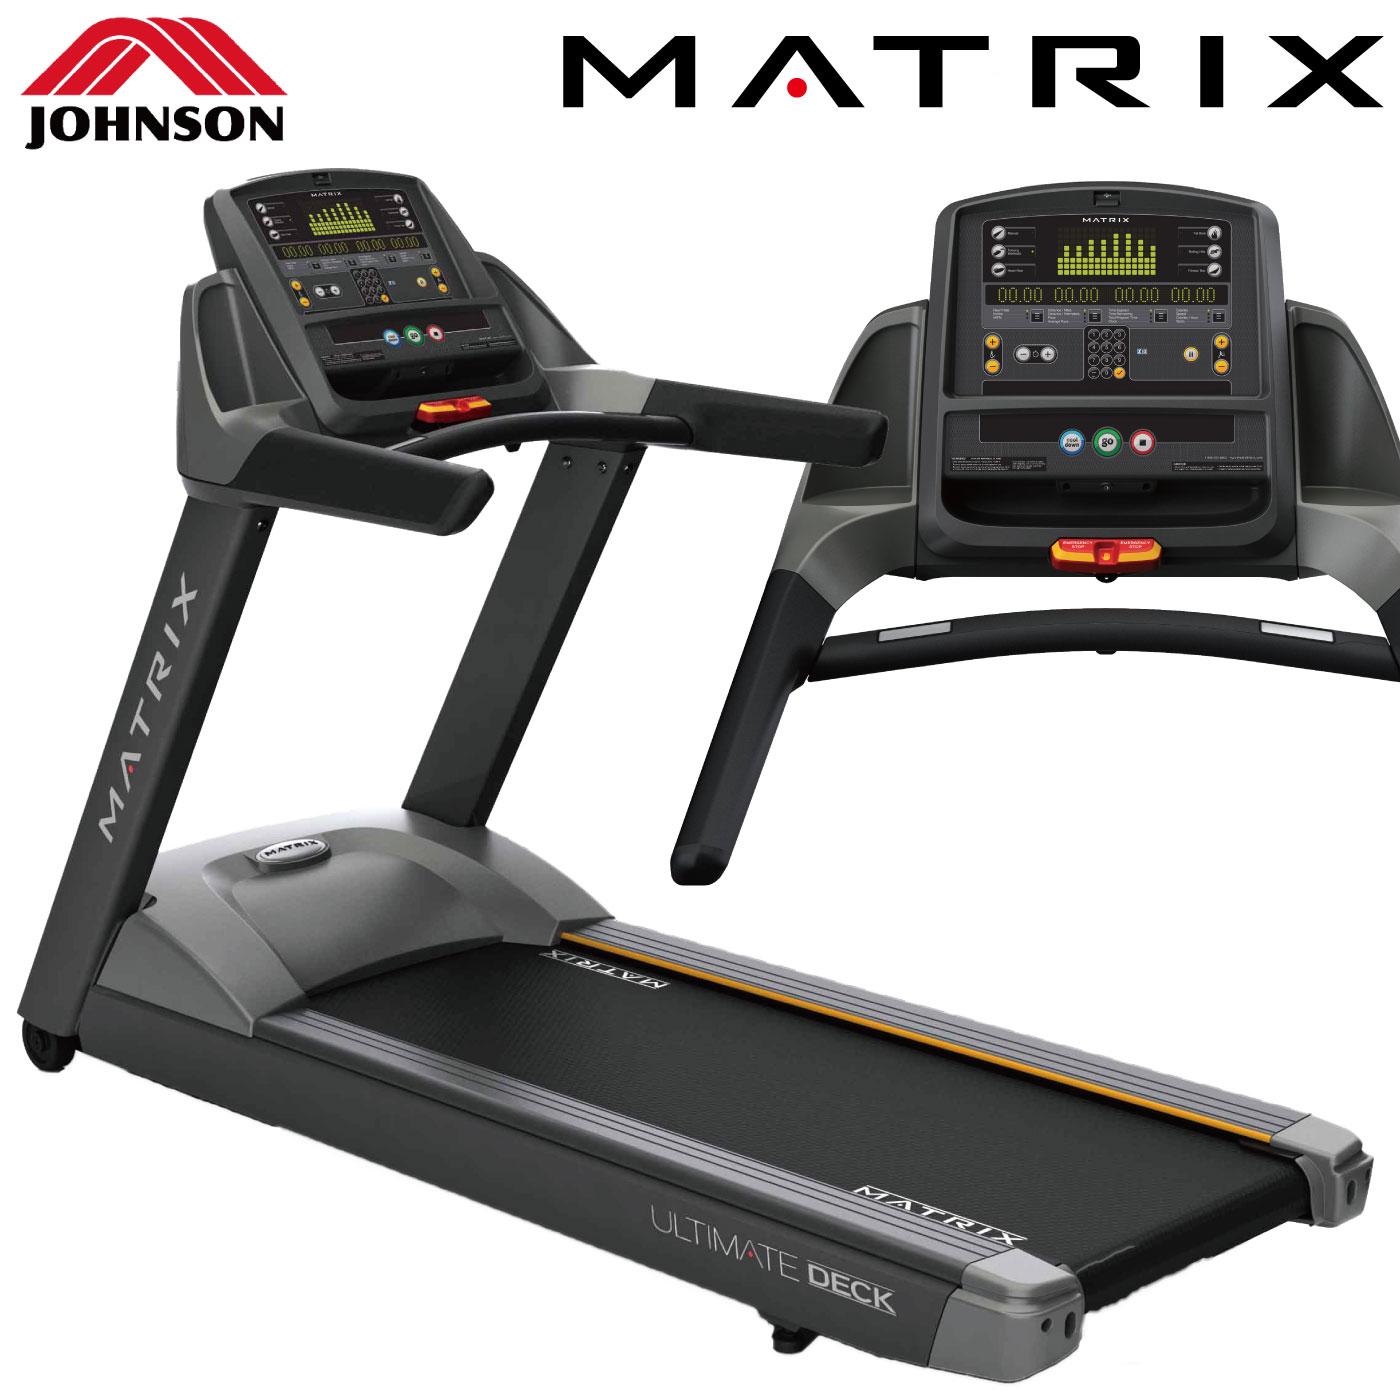 T3x/業務用ランニングマシン〈業務用MATRIX〉《ジョンソンヘルステック》